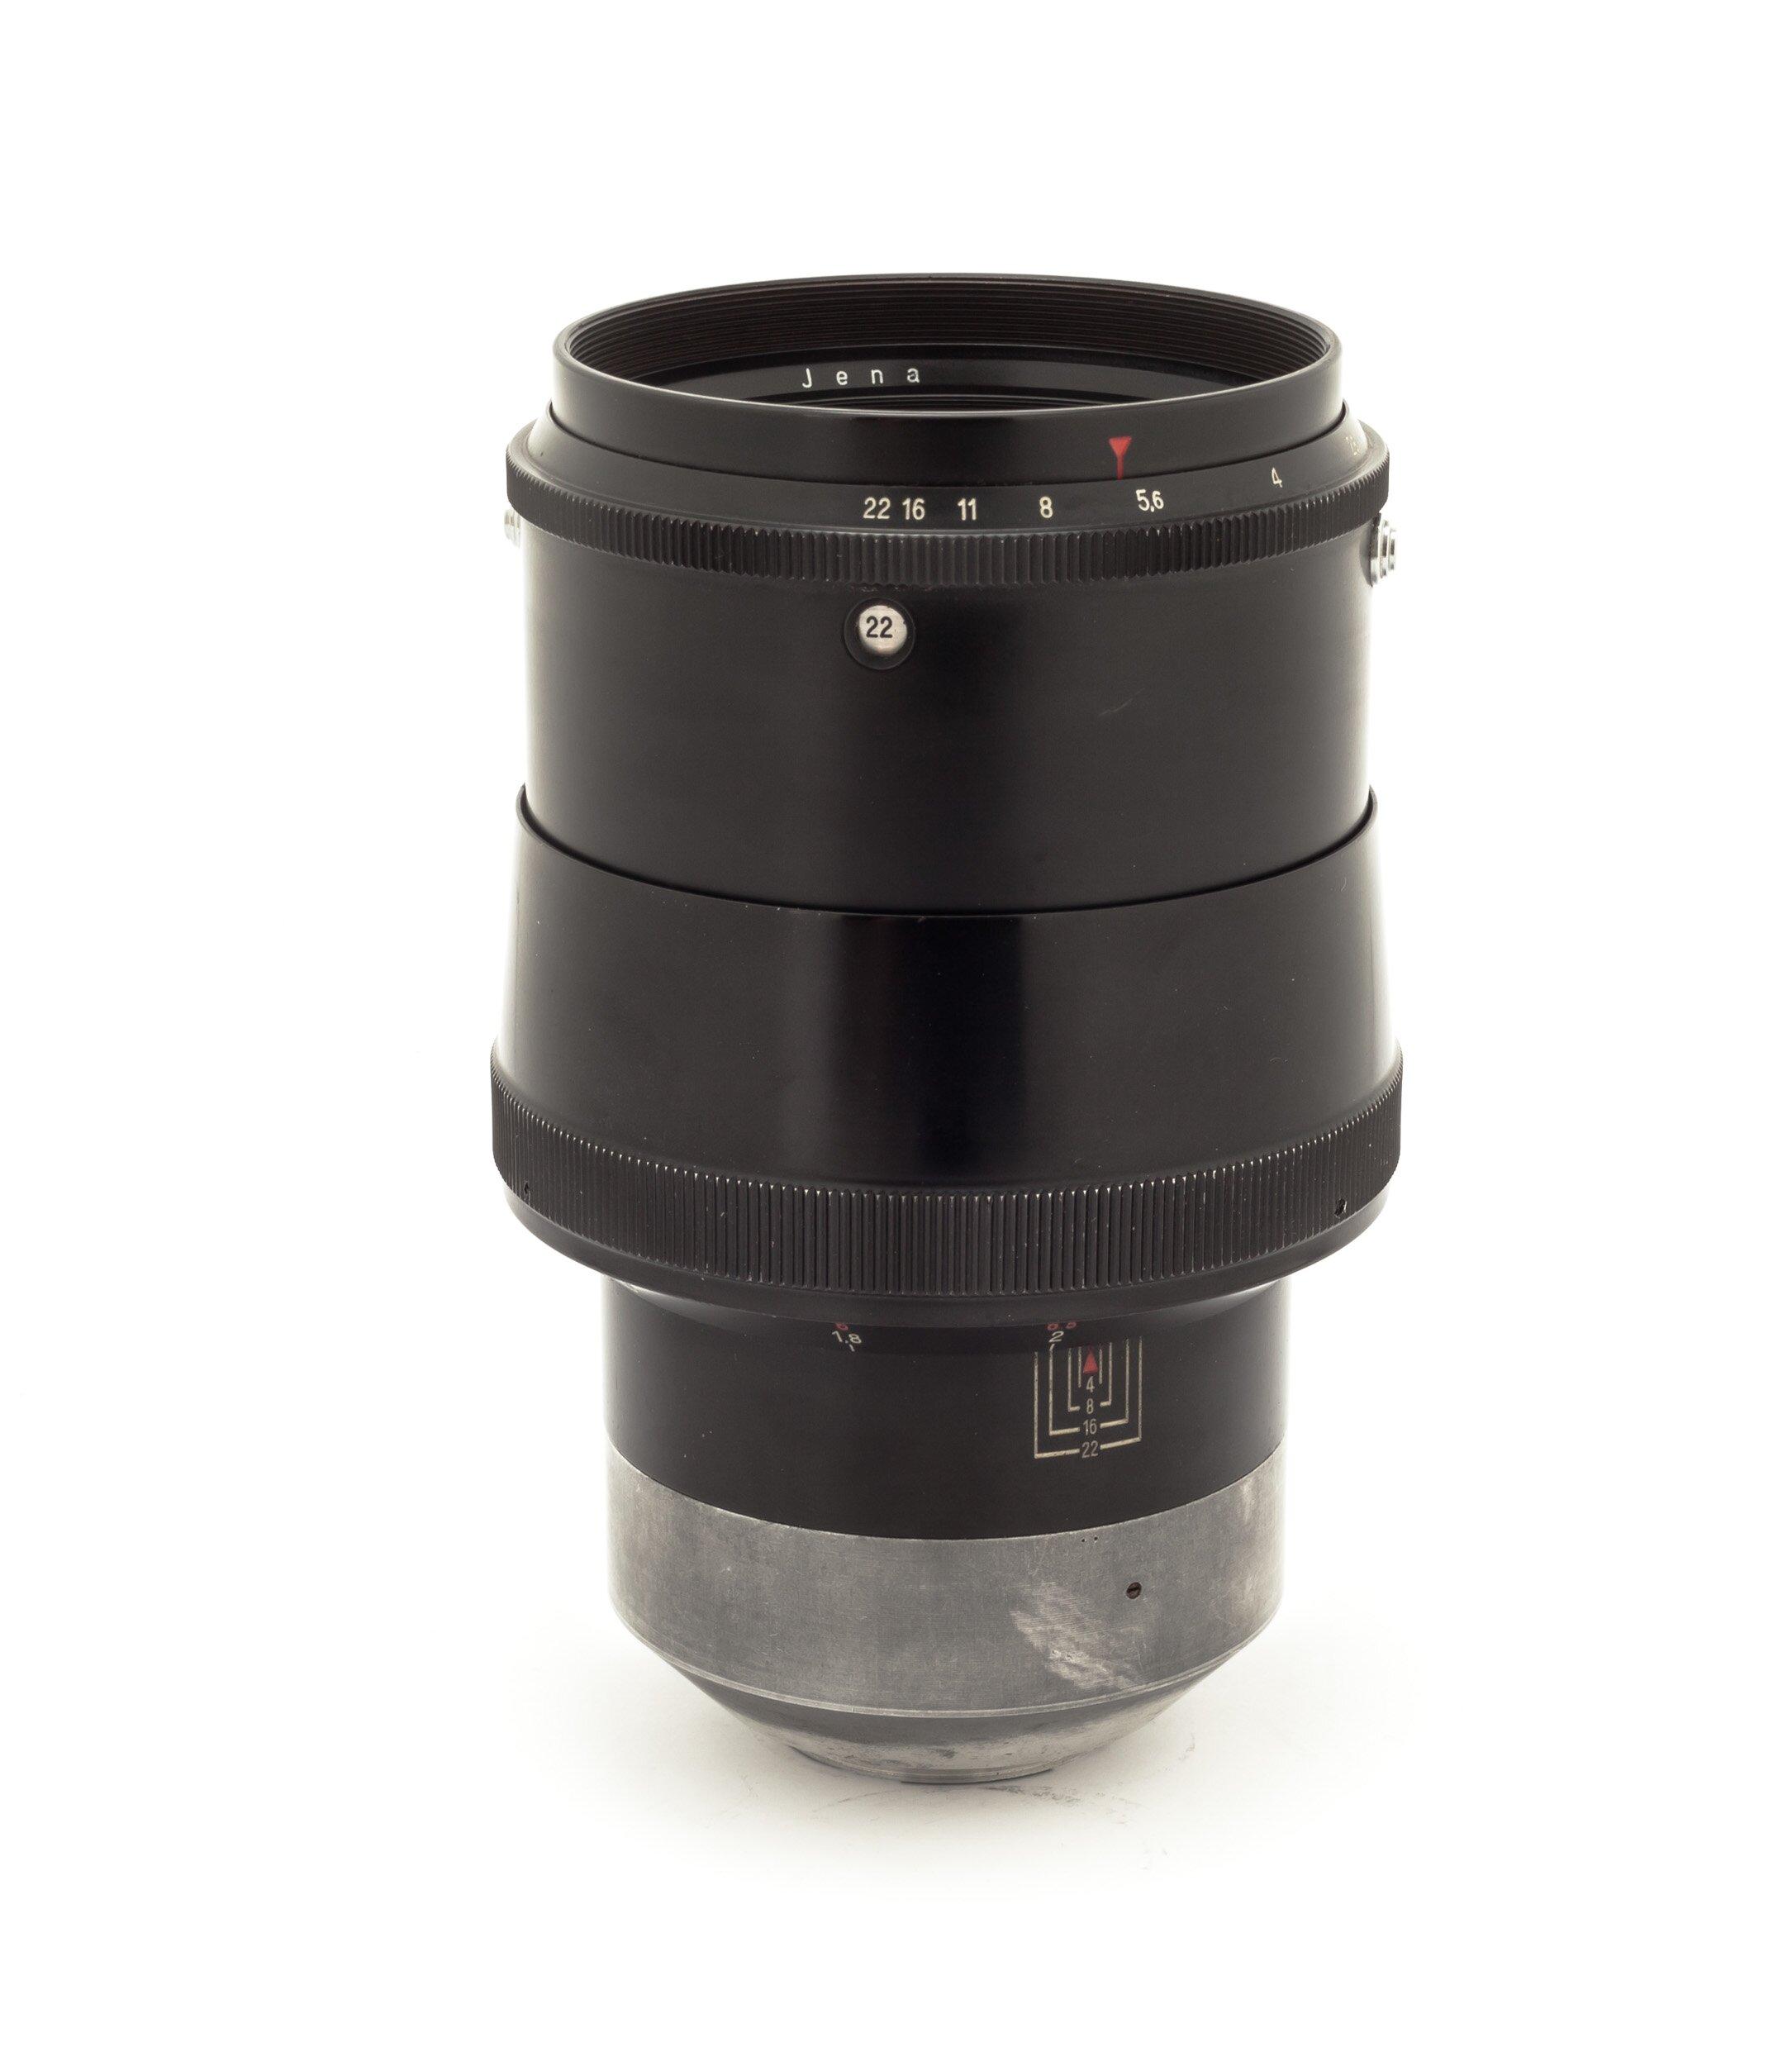 Carl Zeiss 180mm F2.8 Sonnar M39